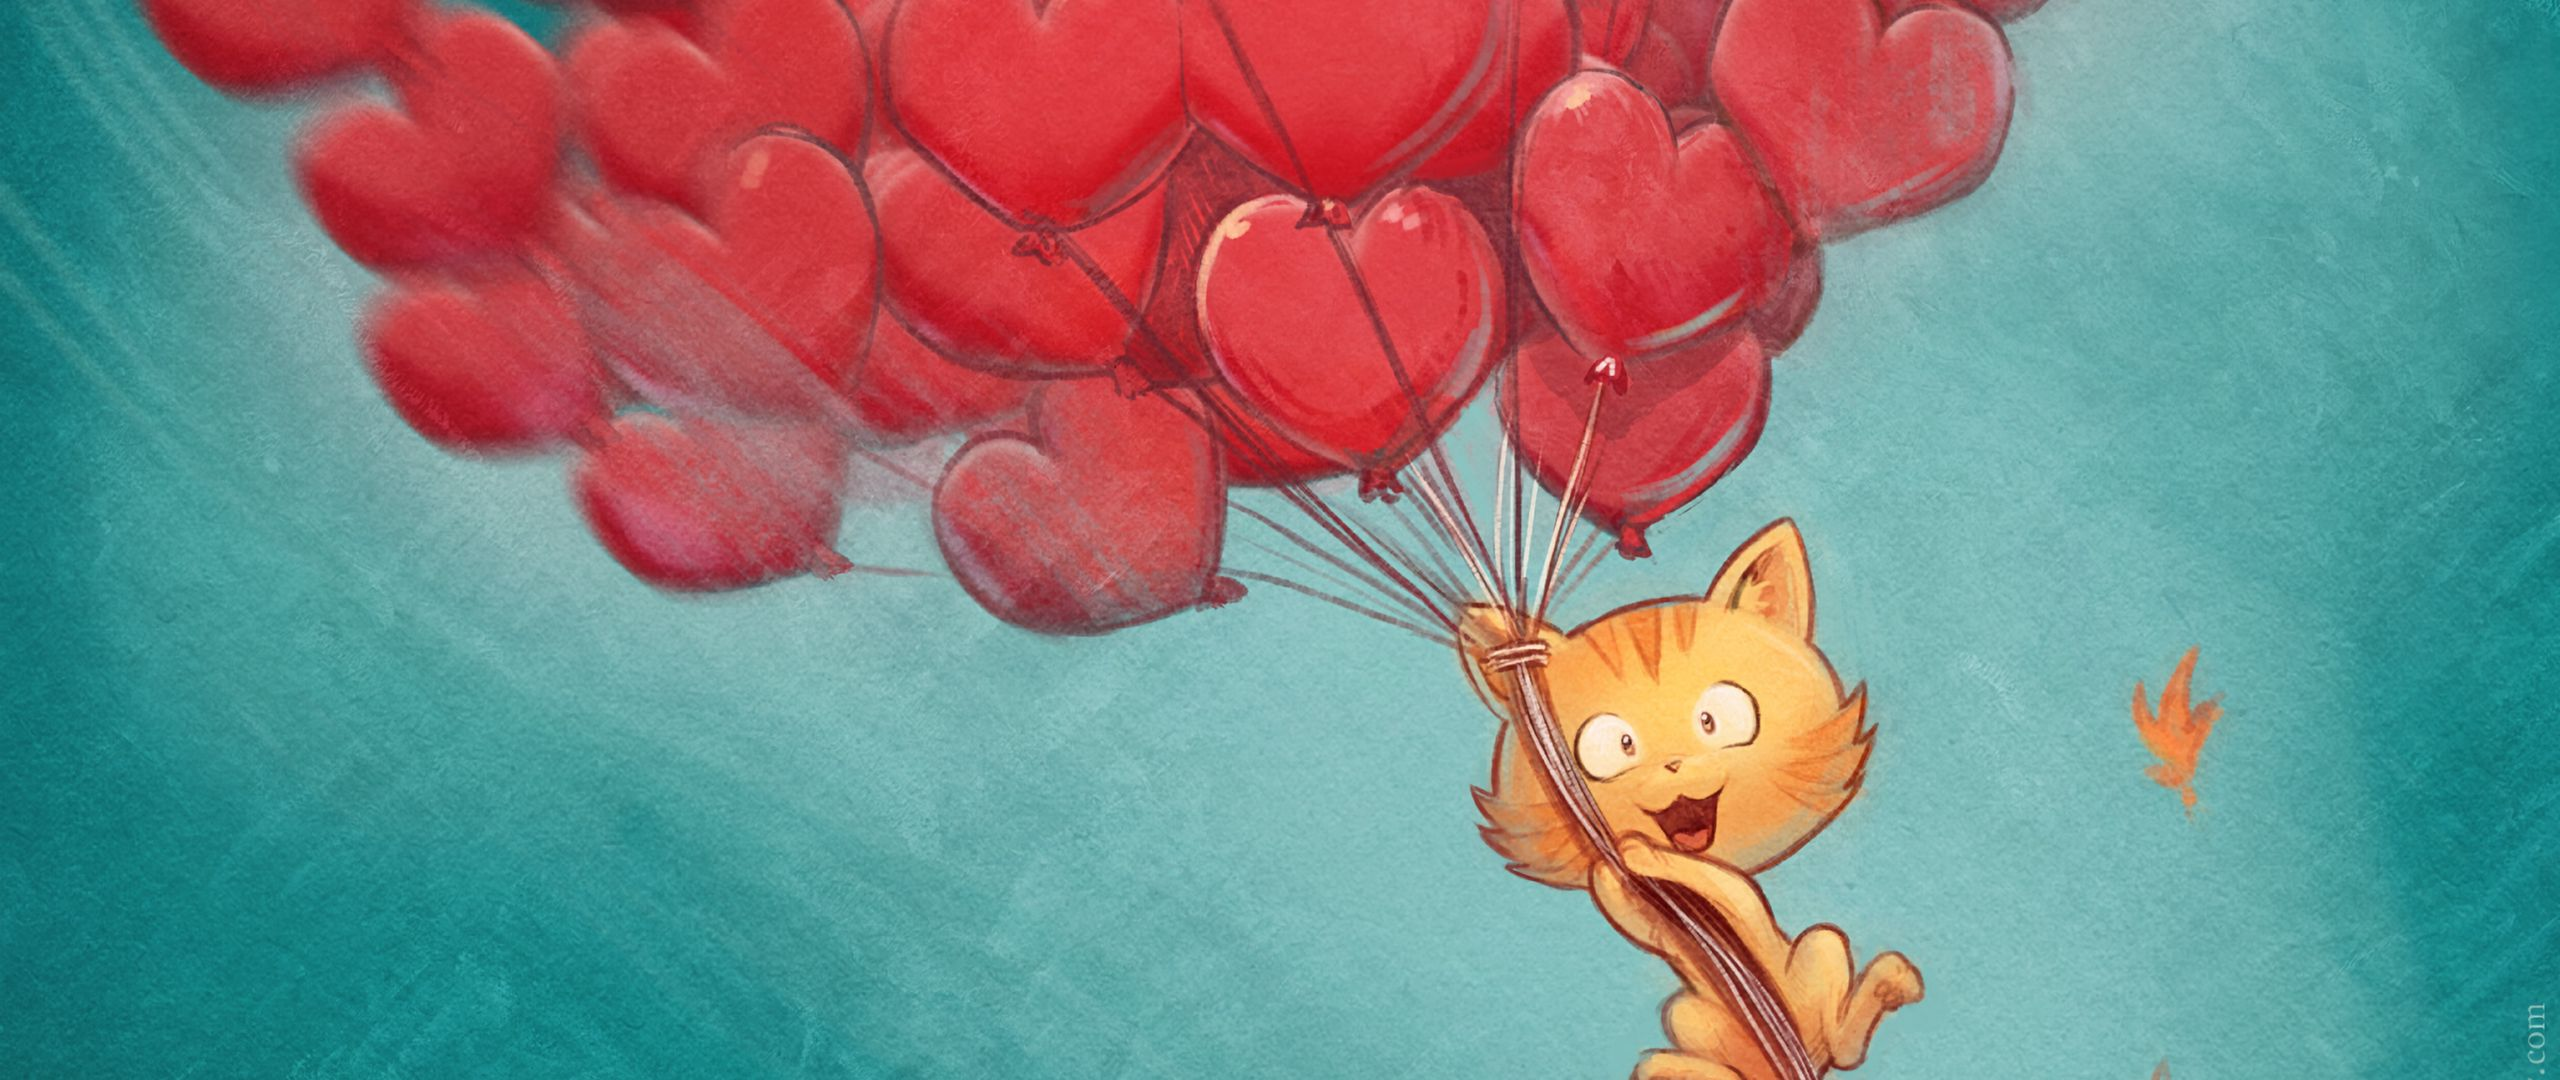 2560x1080 Wallpaper cat, balloons, hearts, flight, sky, art